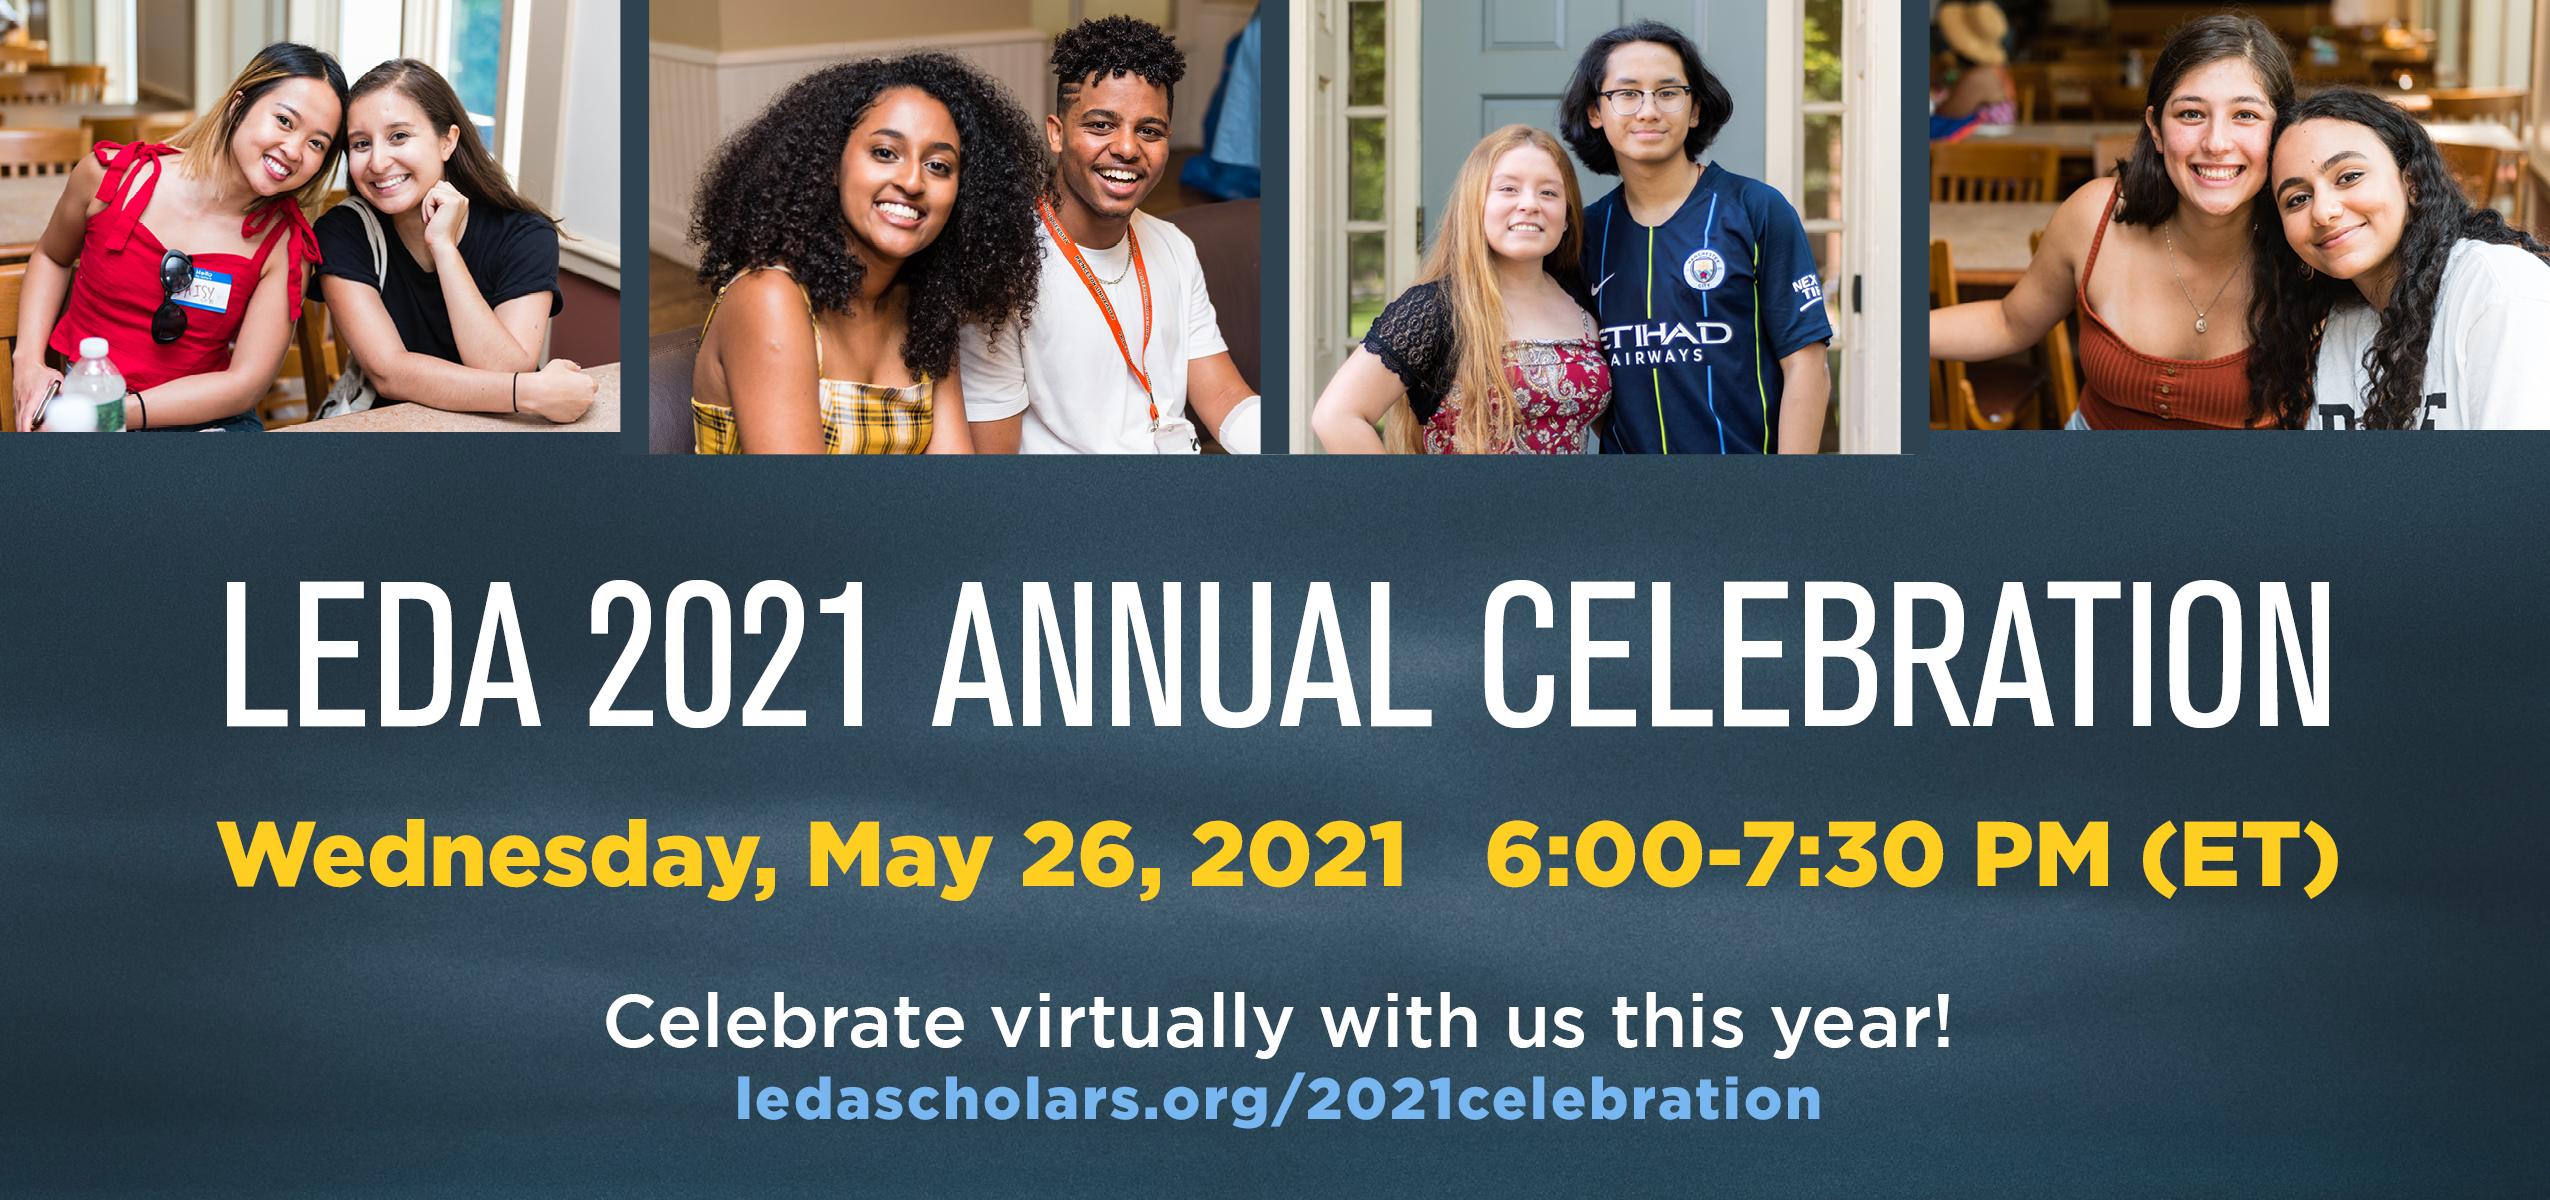 2021 LEDA Celebration 1